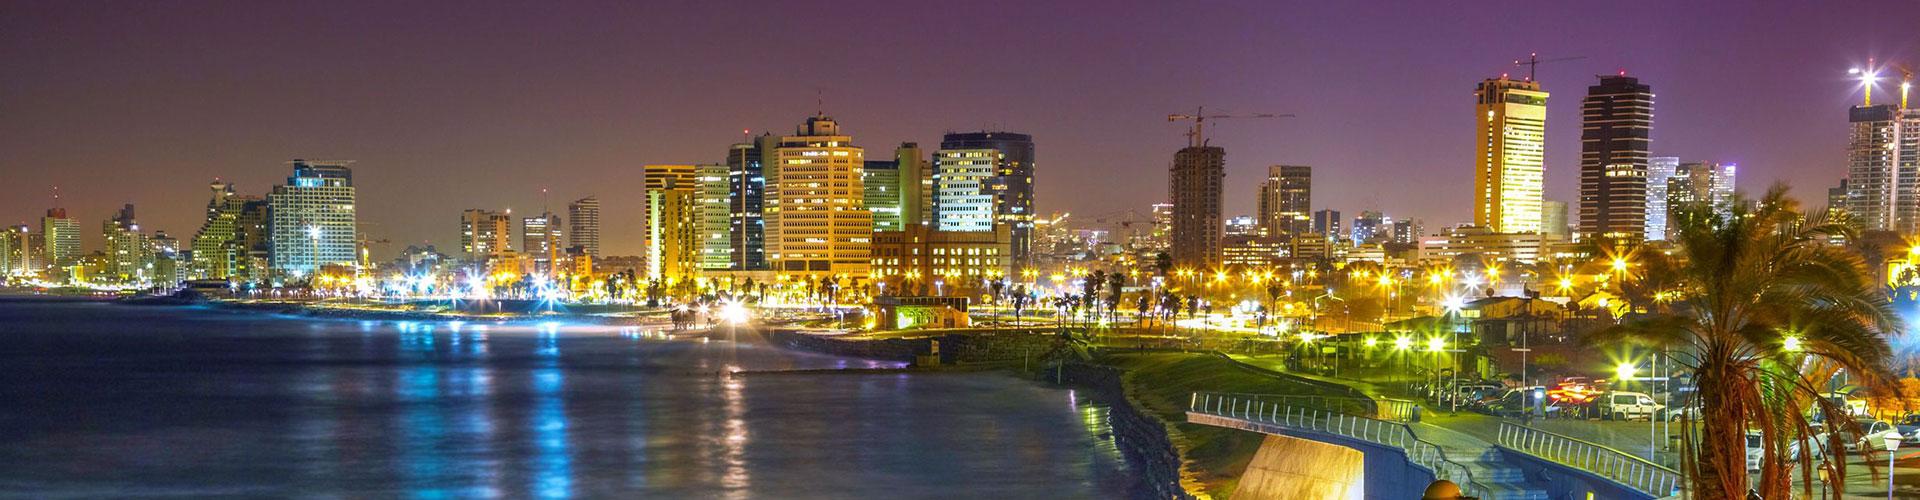 City Break à Tel Aviv et Jérusalem